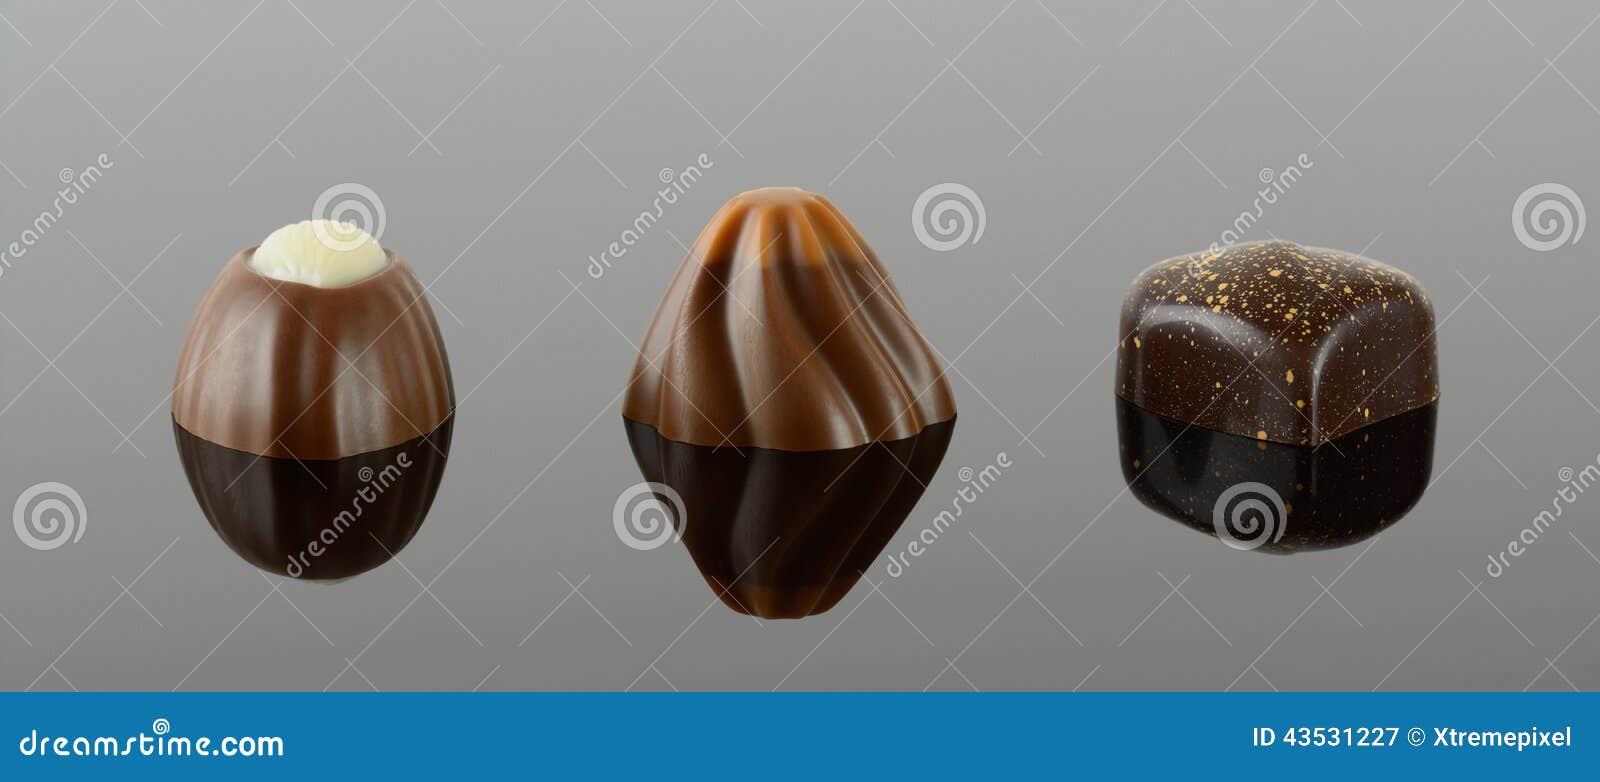 Three luxury chocolates